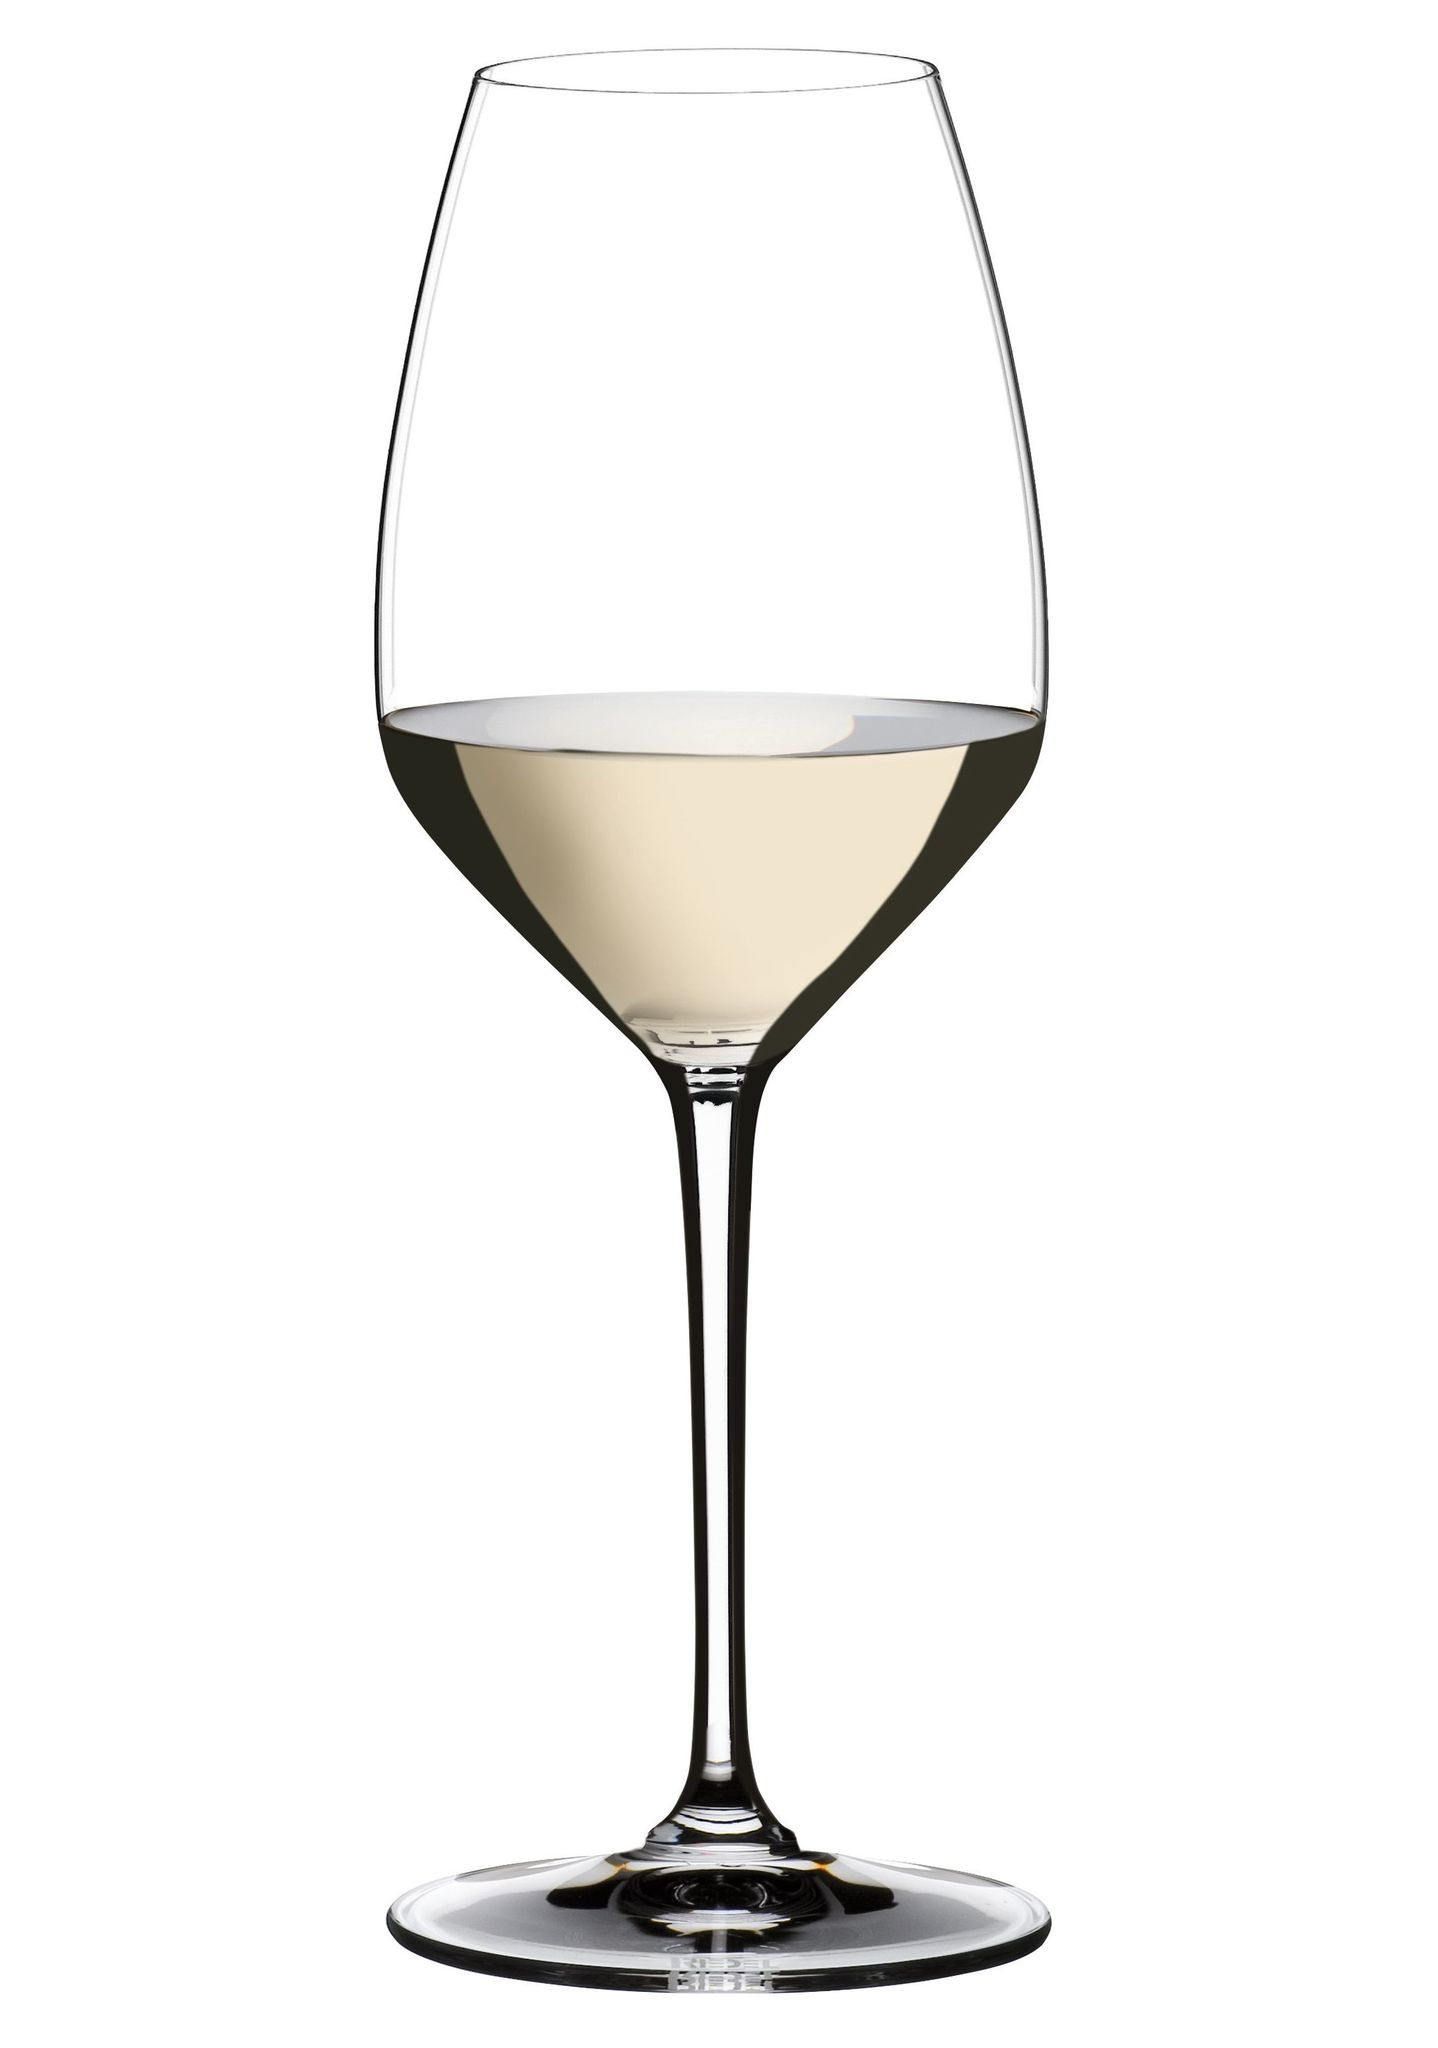 Бокалы Набор бокалов для белого вина 2 шт 460 мл Riedel Heart to Heart Riesling nabor-bokalov-dlya-belogo-vina-2-sht-460-ml-riedel-heart-to-heart-riesling-avstriya.jpg